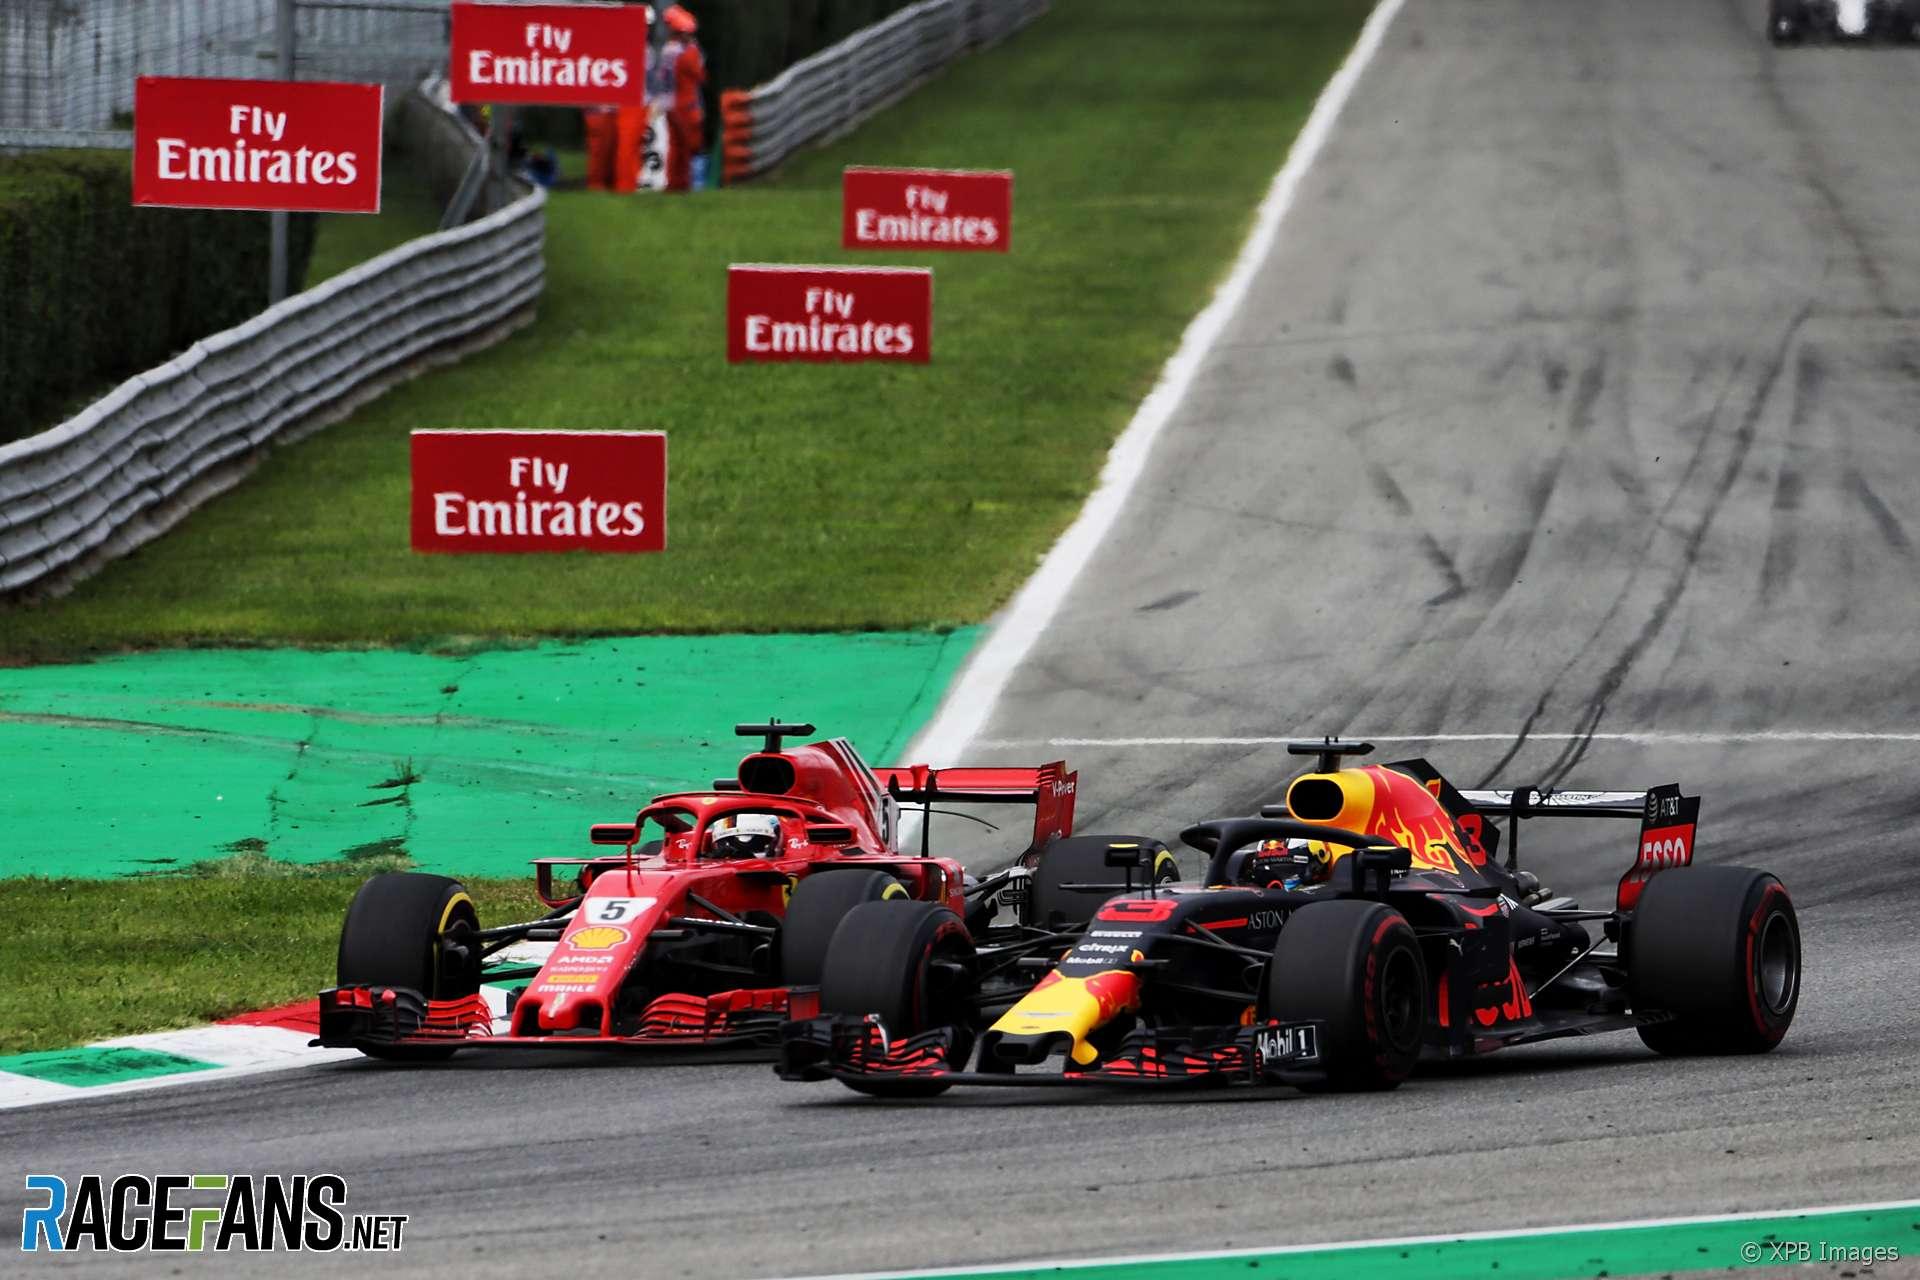 Sebastian Vettel, Daniel Ricciardo, Monza, 2018